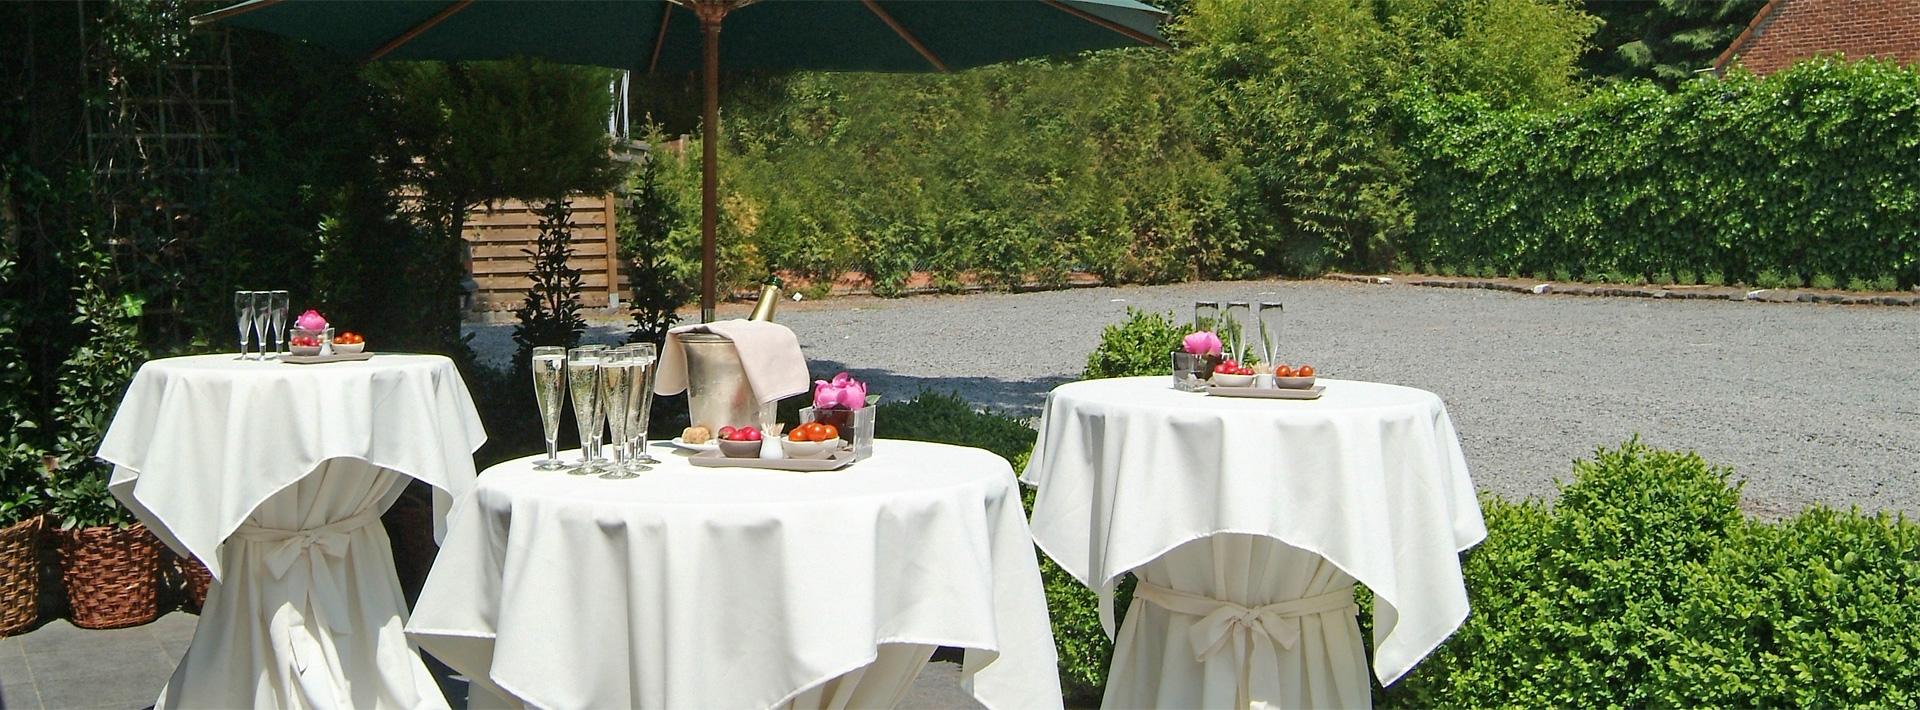 restaurant-malpertus-in-st-niklaas_DSCF2929